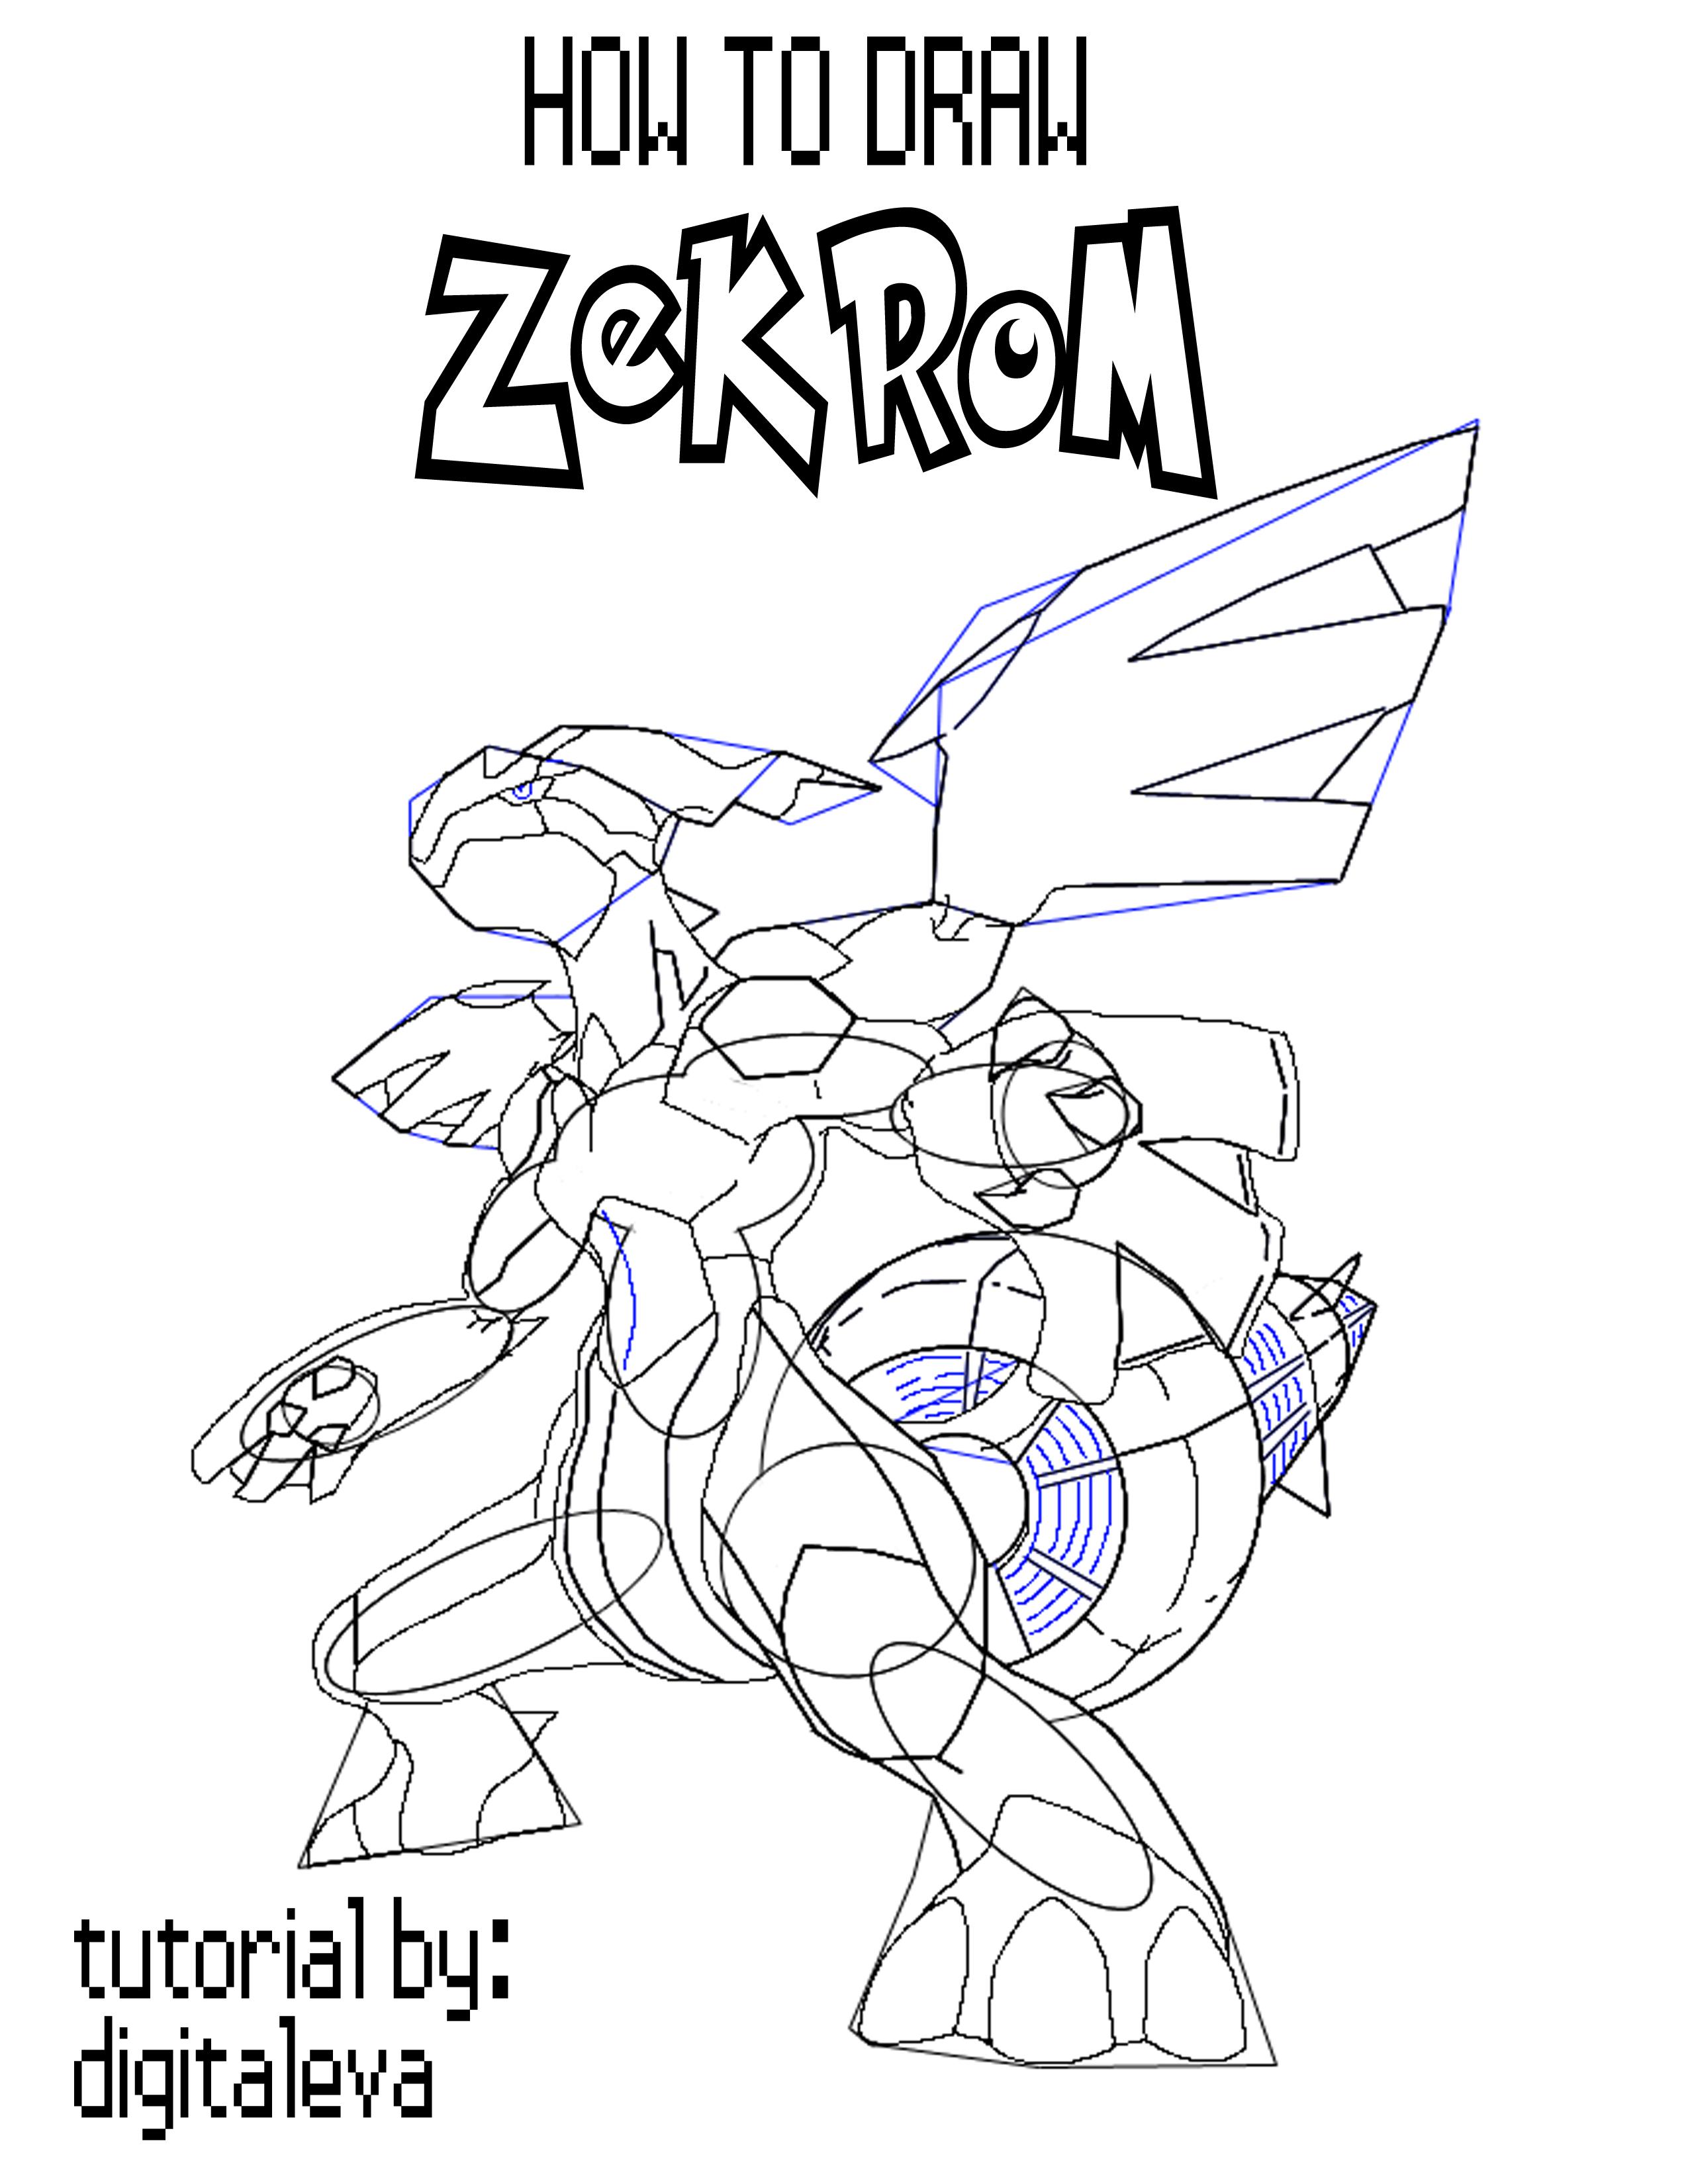 How to draw zekrom by digitaleva on deviantart how to draw zekrom by digitaleva how to draw zekrom by digitaleva ccuart Images